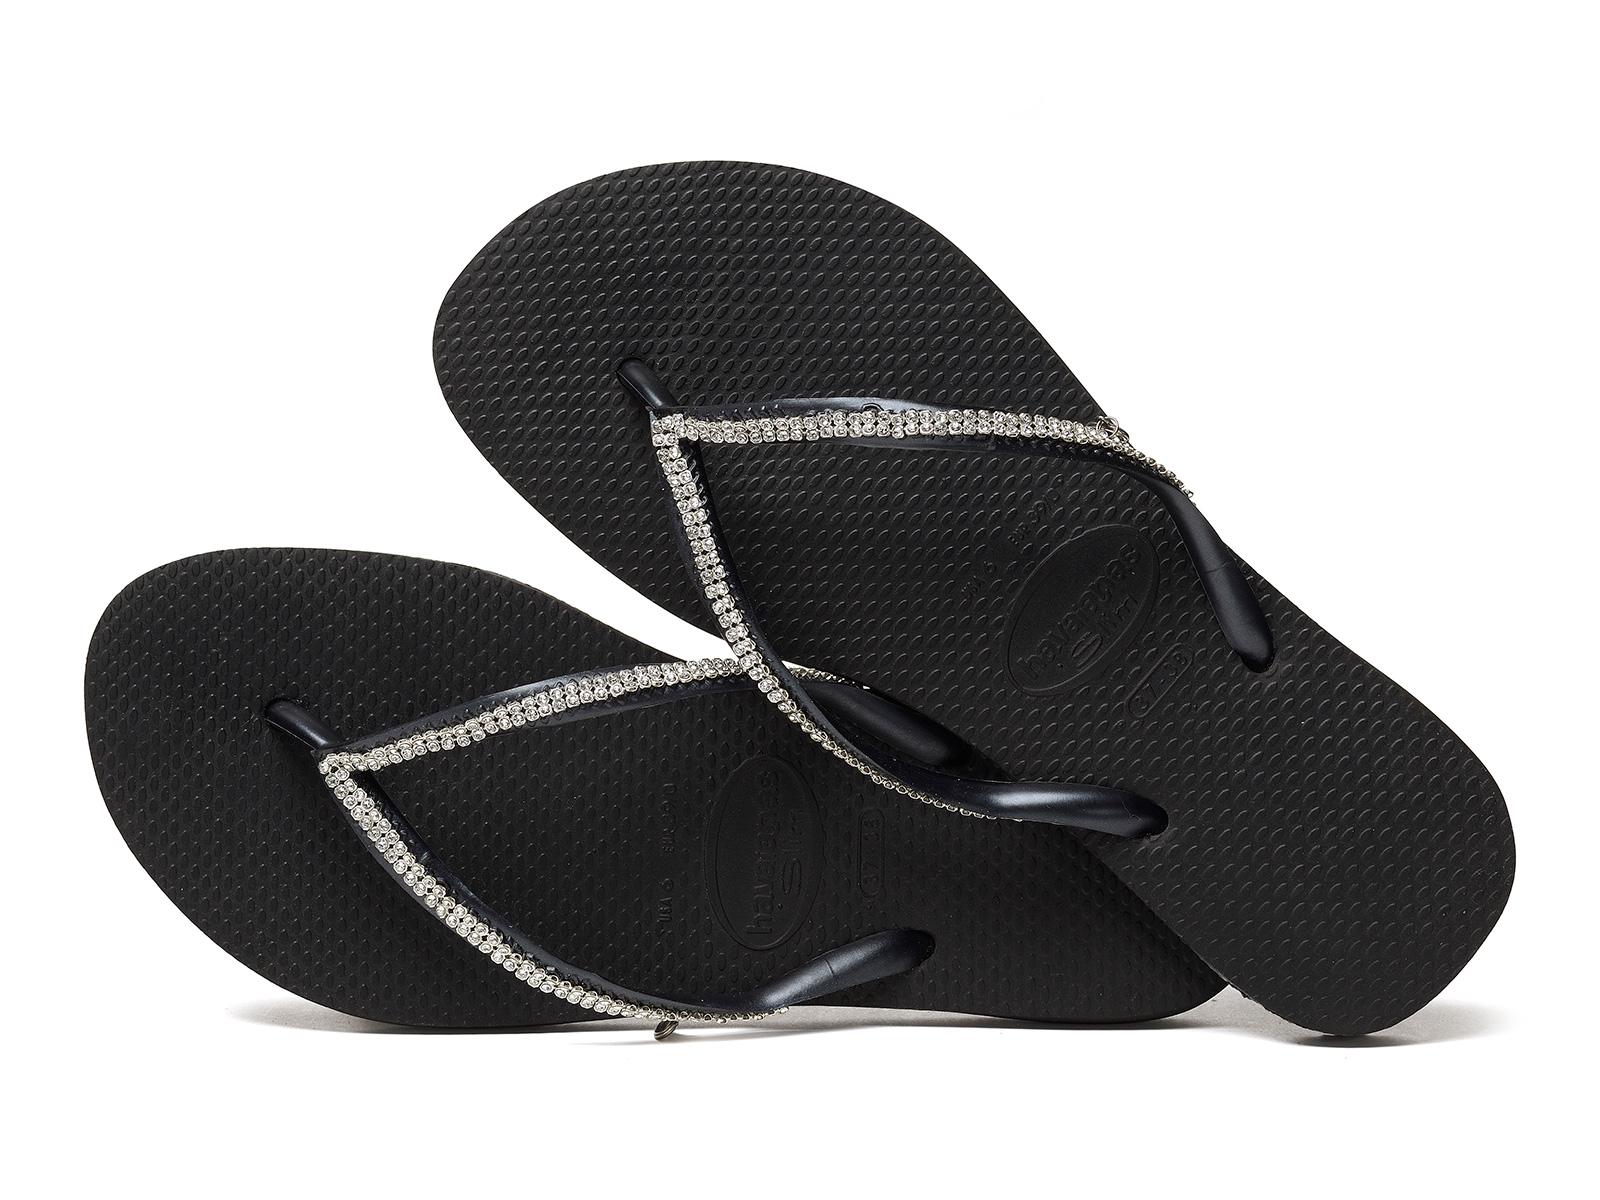 10dbbf7342ef ... Black flip-flops with Swarovski crystals - Slim Crystal Mesh Sw Black  ...